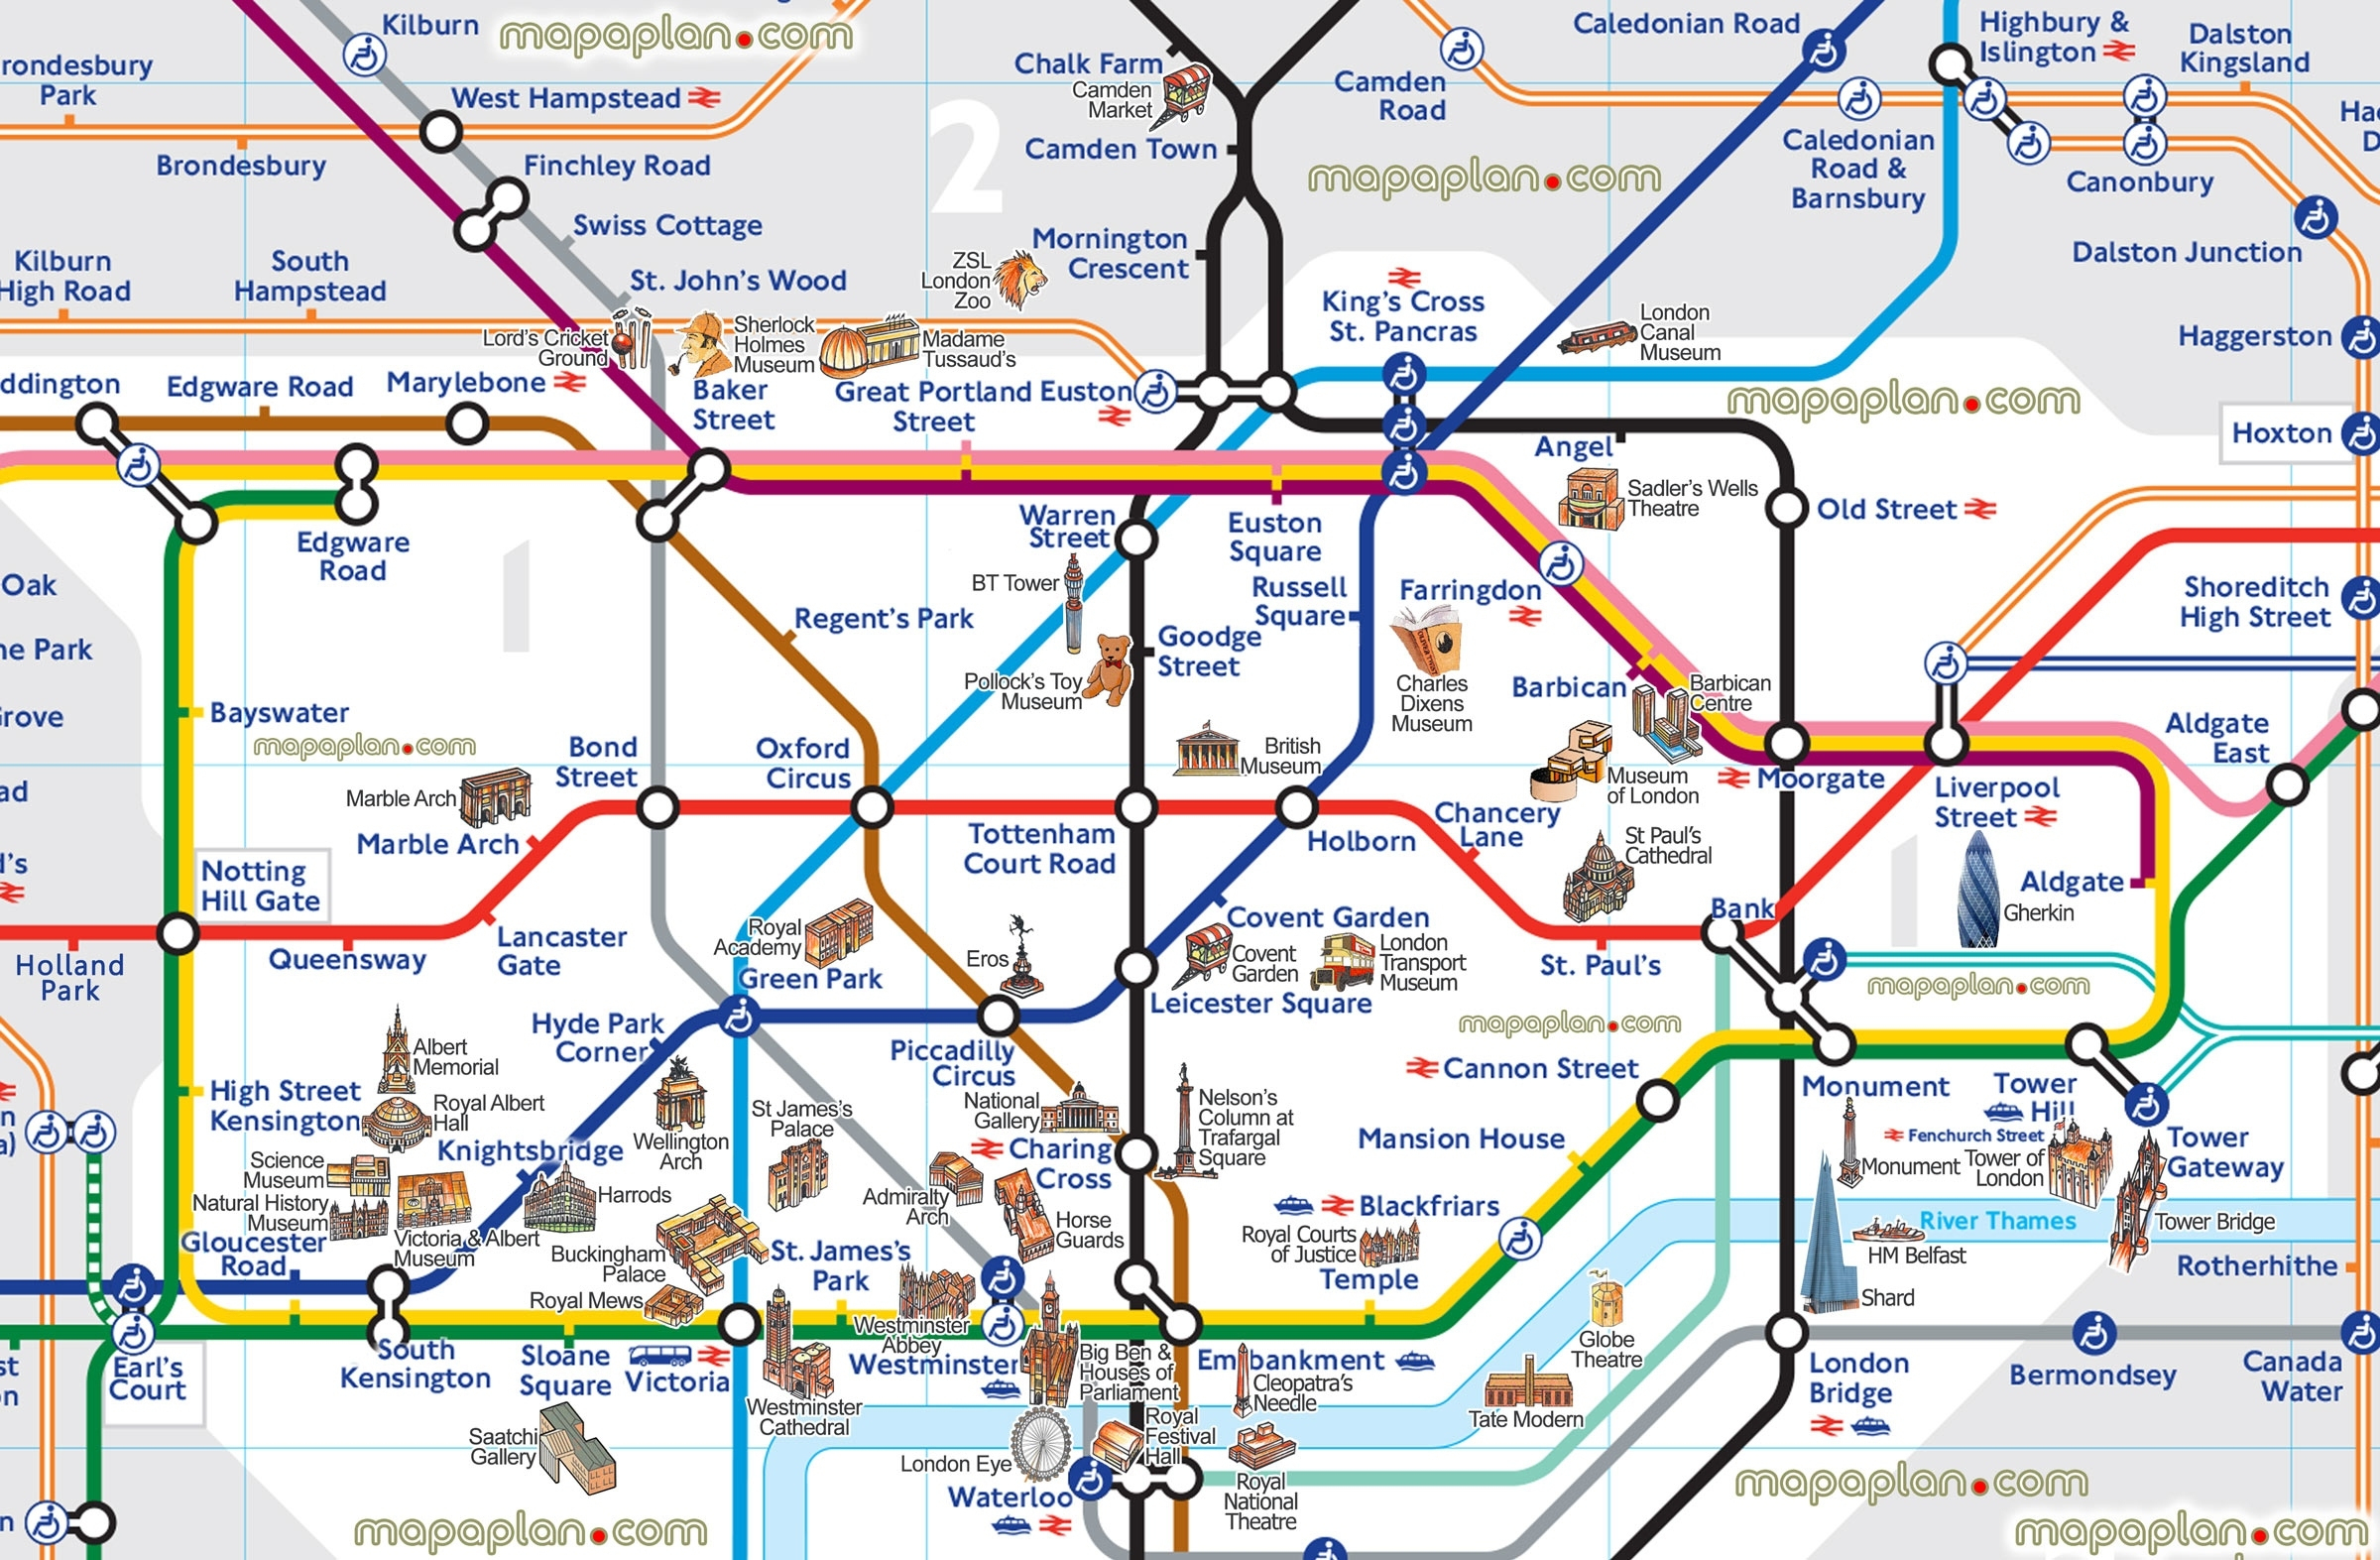 London Underground Map With Tourist Attractions – Uk Map - Printable London Underground Map